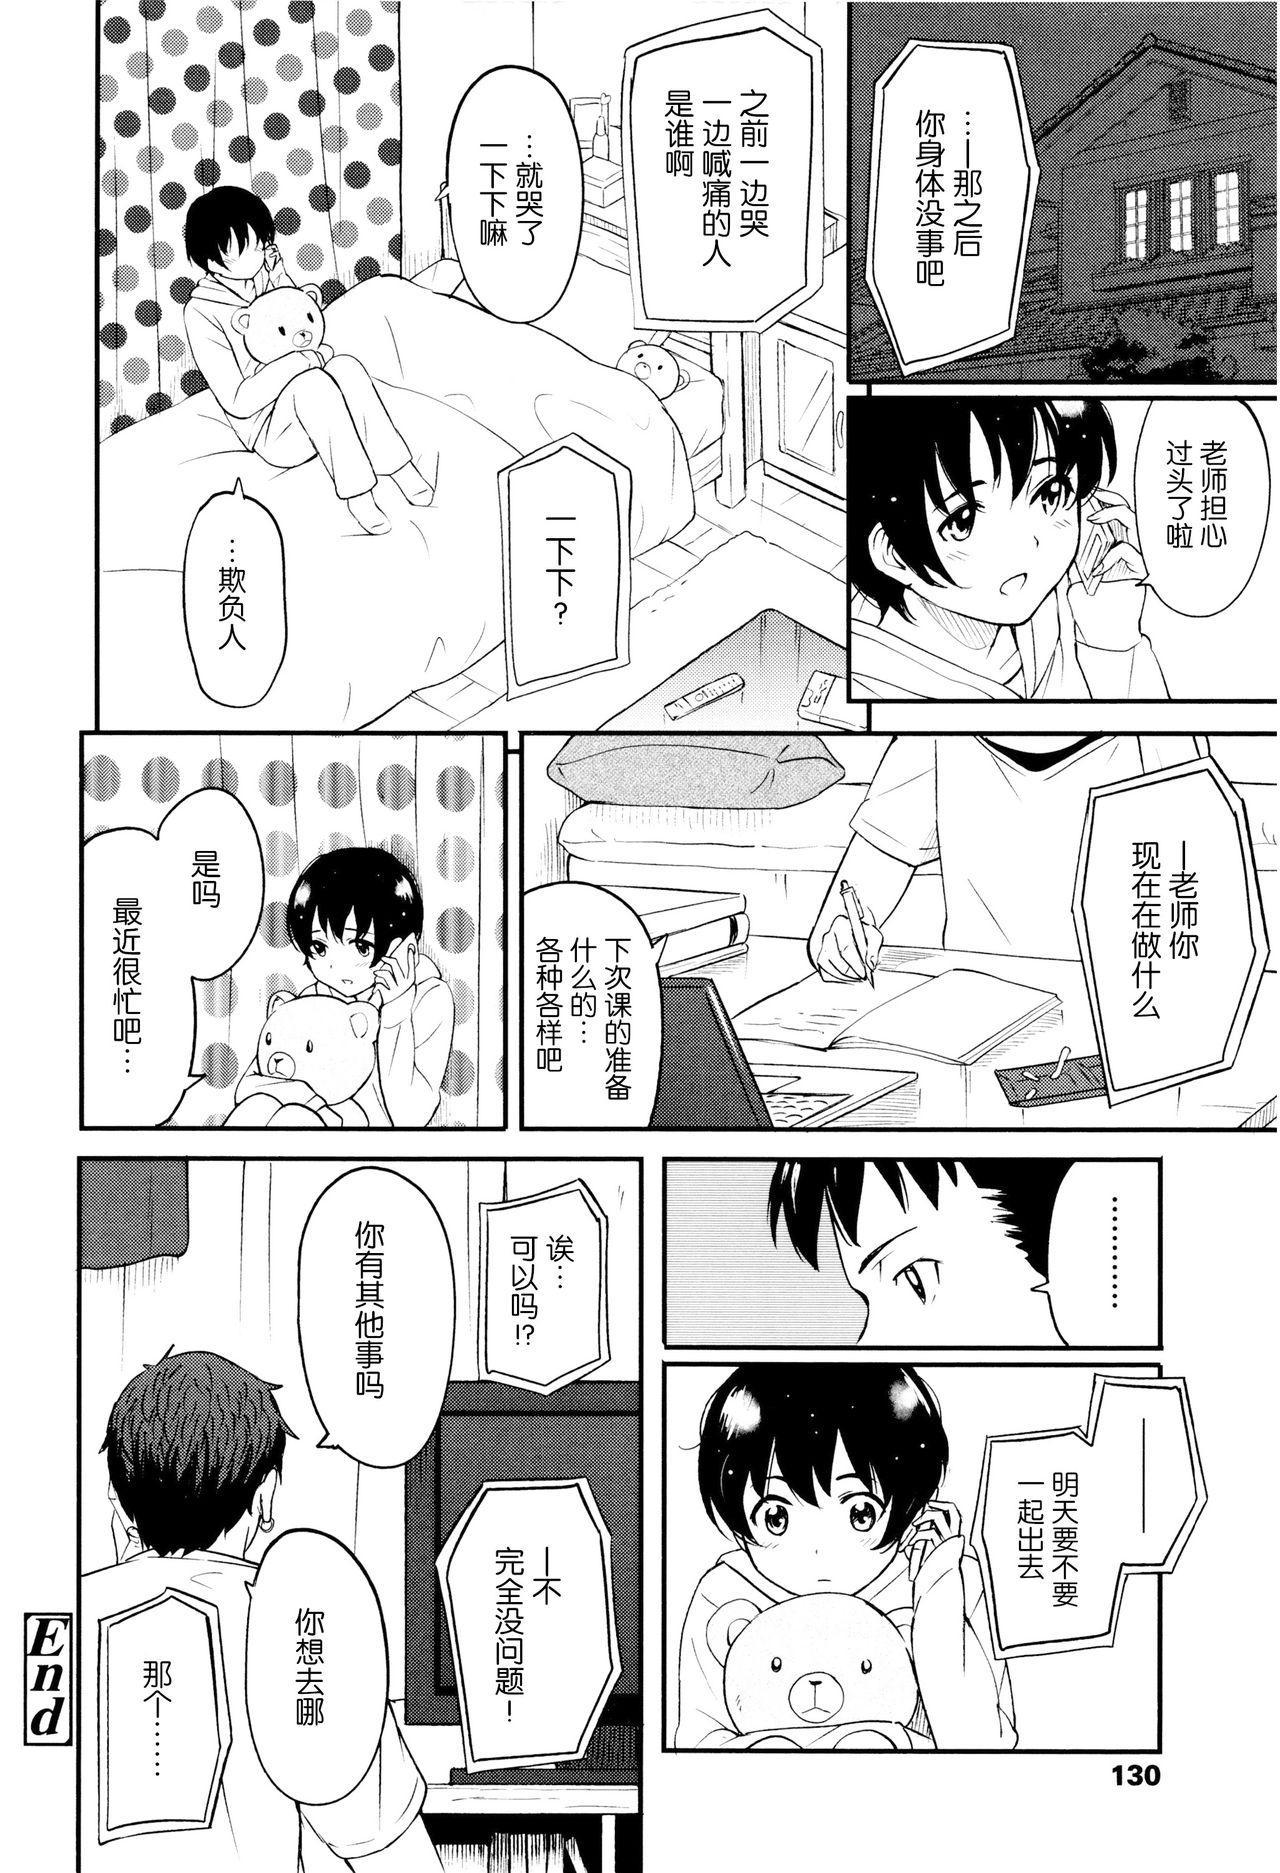 Tokubetsu na Mainichi - Special daily 132